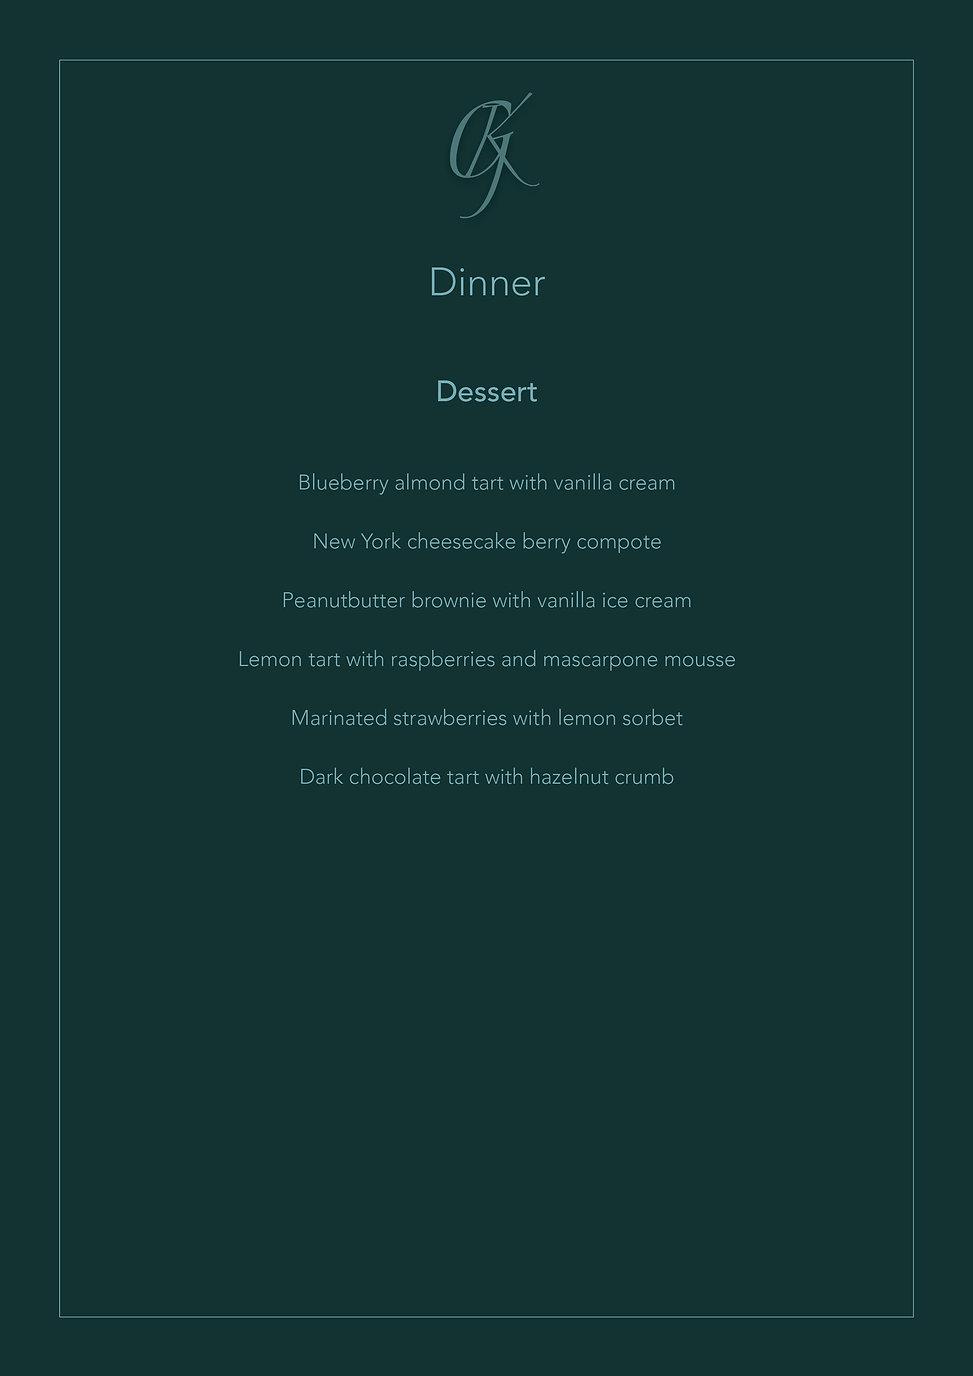 Menu_Fine_Dining5.jpg